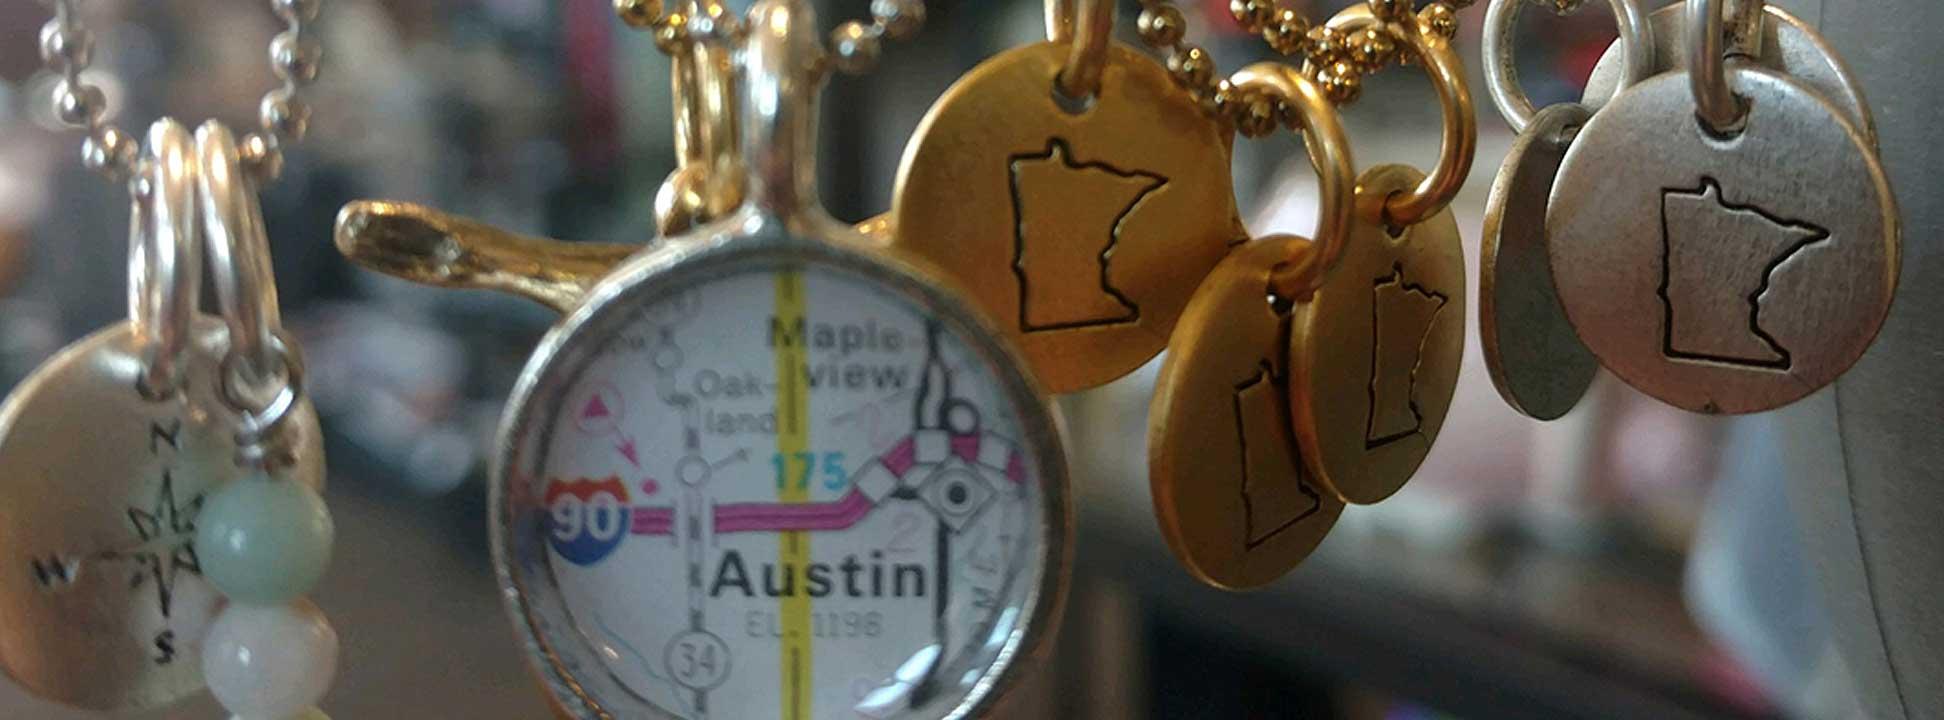 Discover Austin Variety